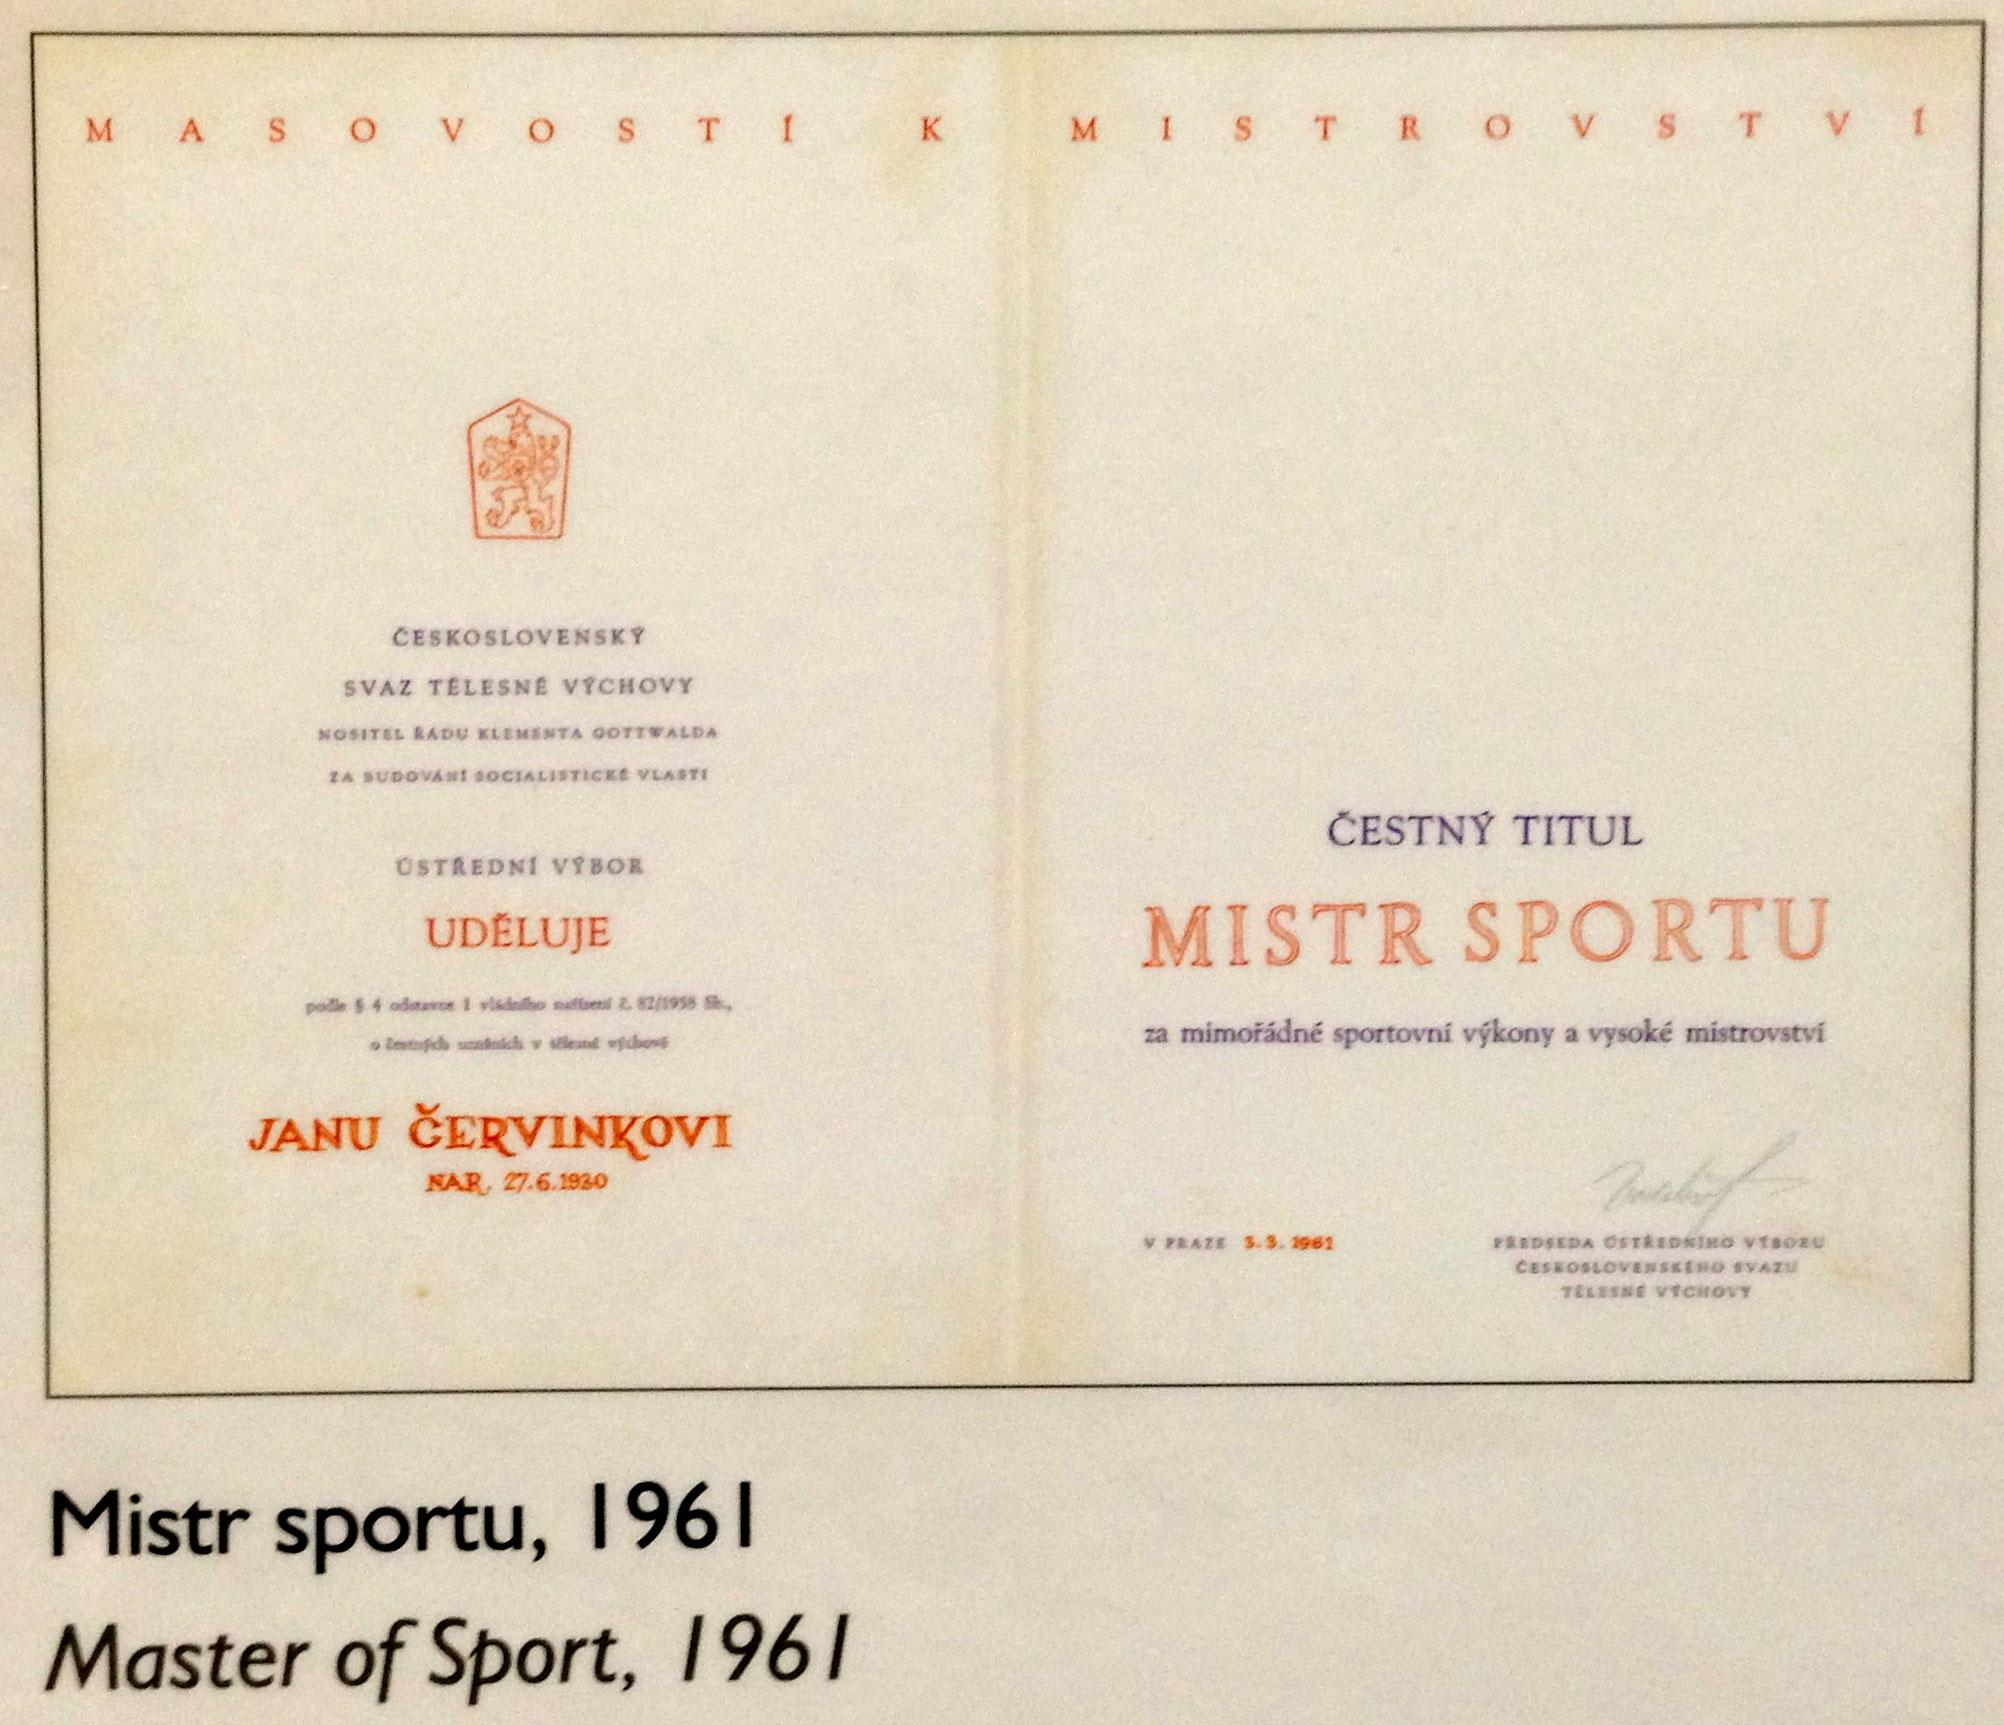 Diplom Mistra sportu